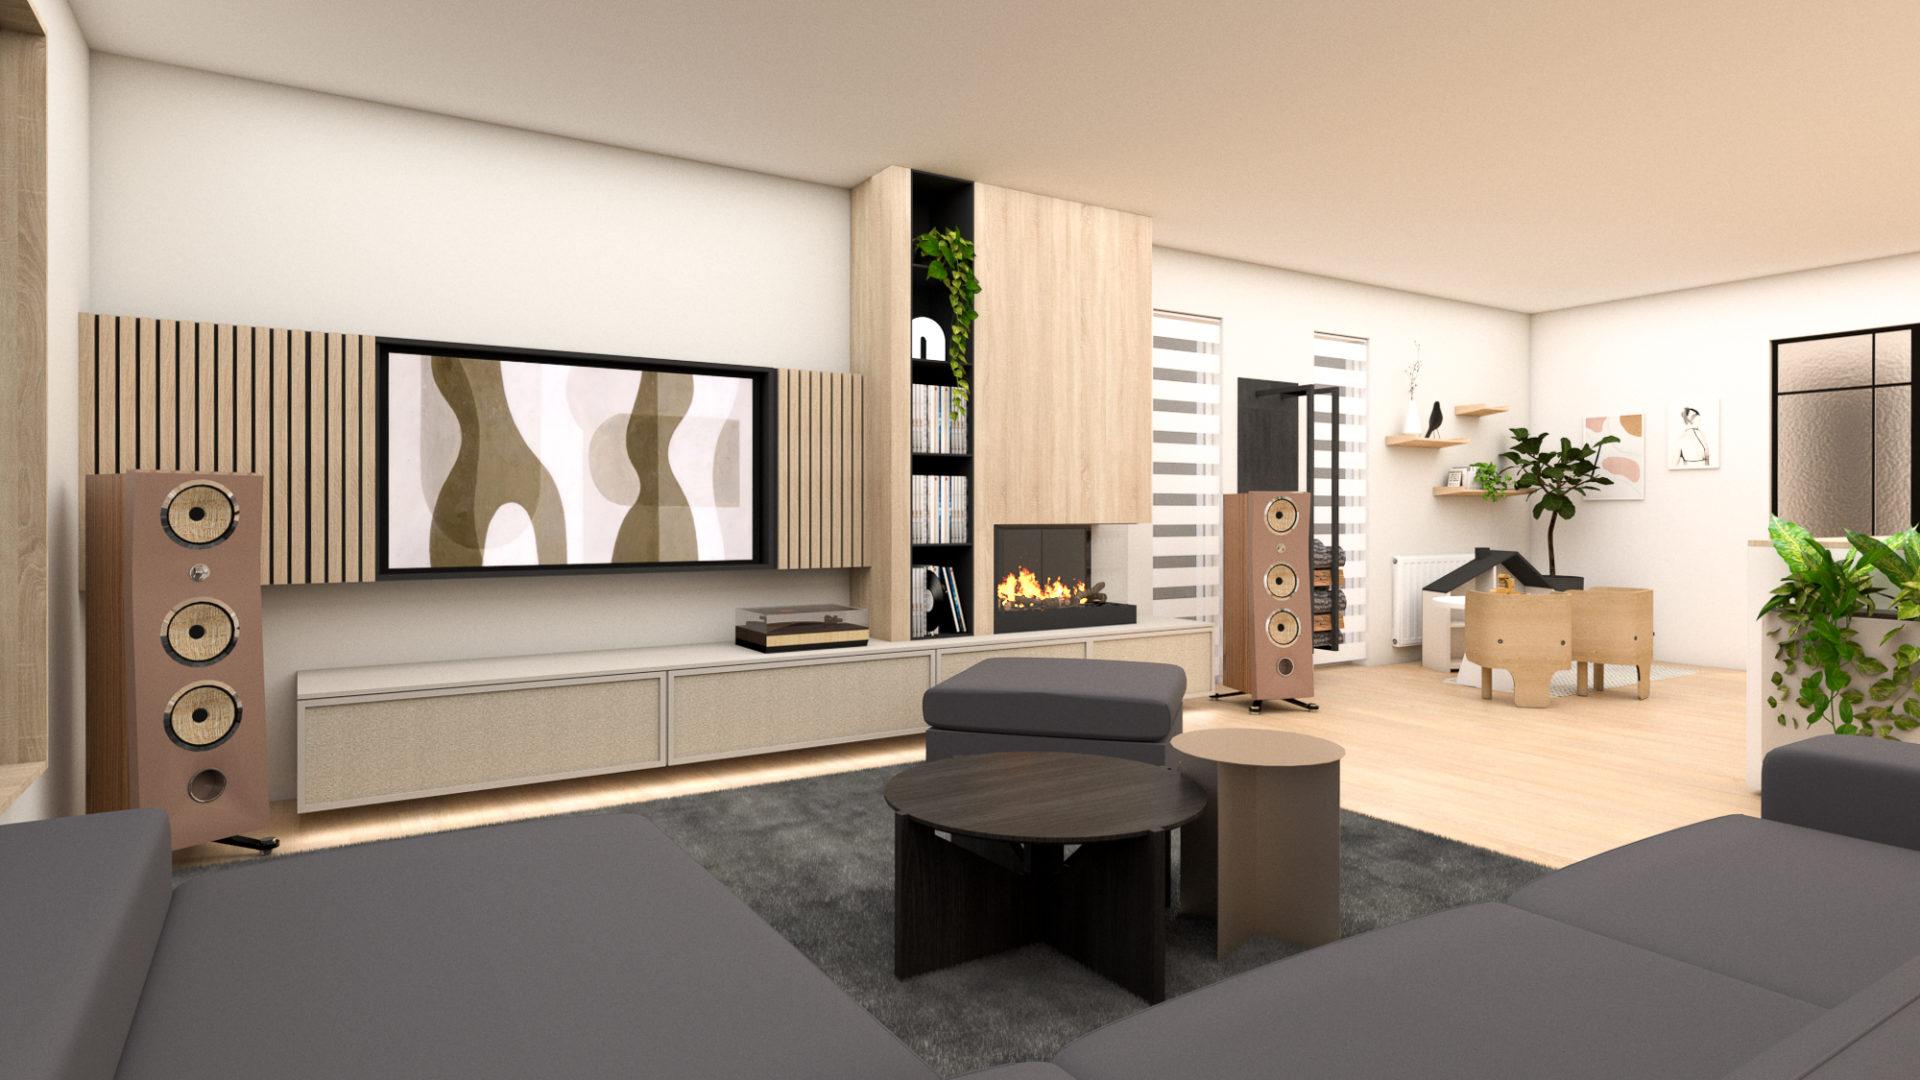 Architecture d'interieur Spa - rendu salon